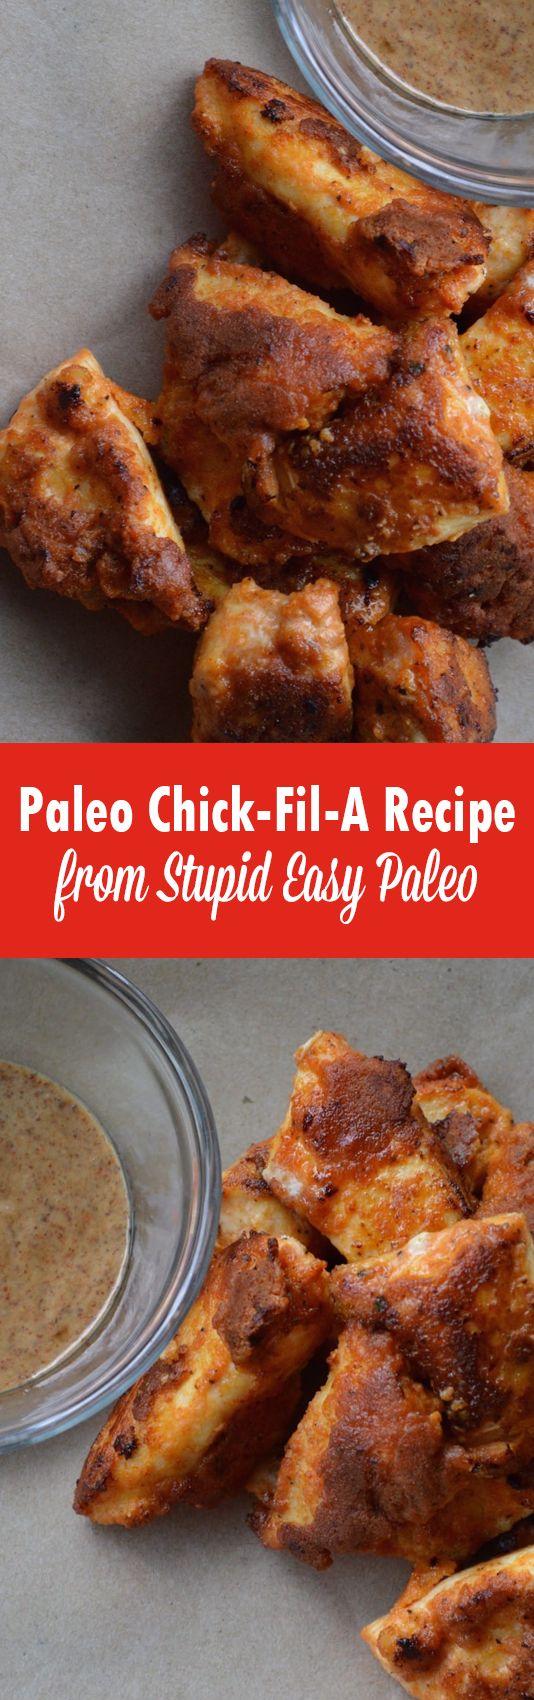 Paleo+Chick-Fil-A+Recipe+|+StupidEasyPaleo.com